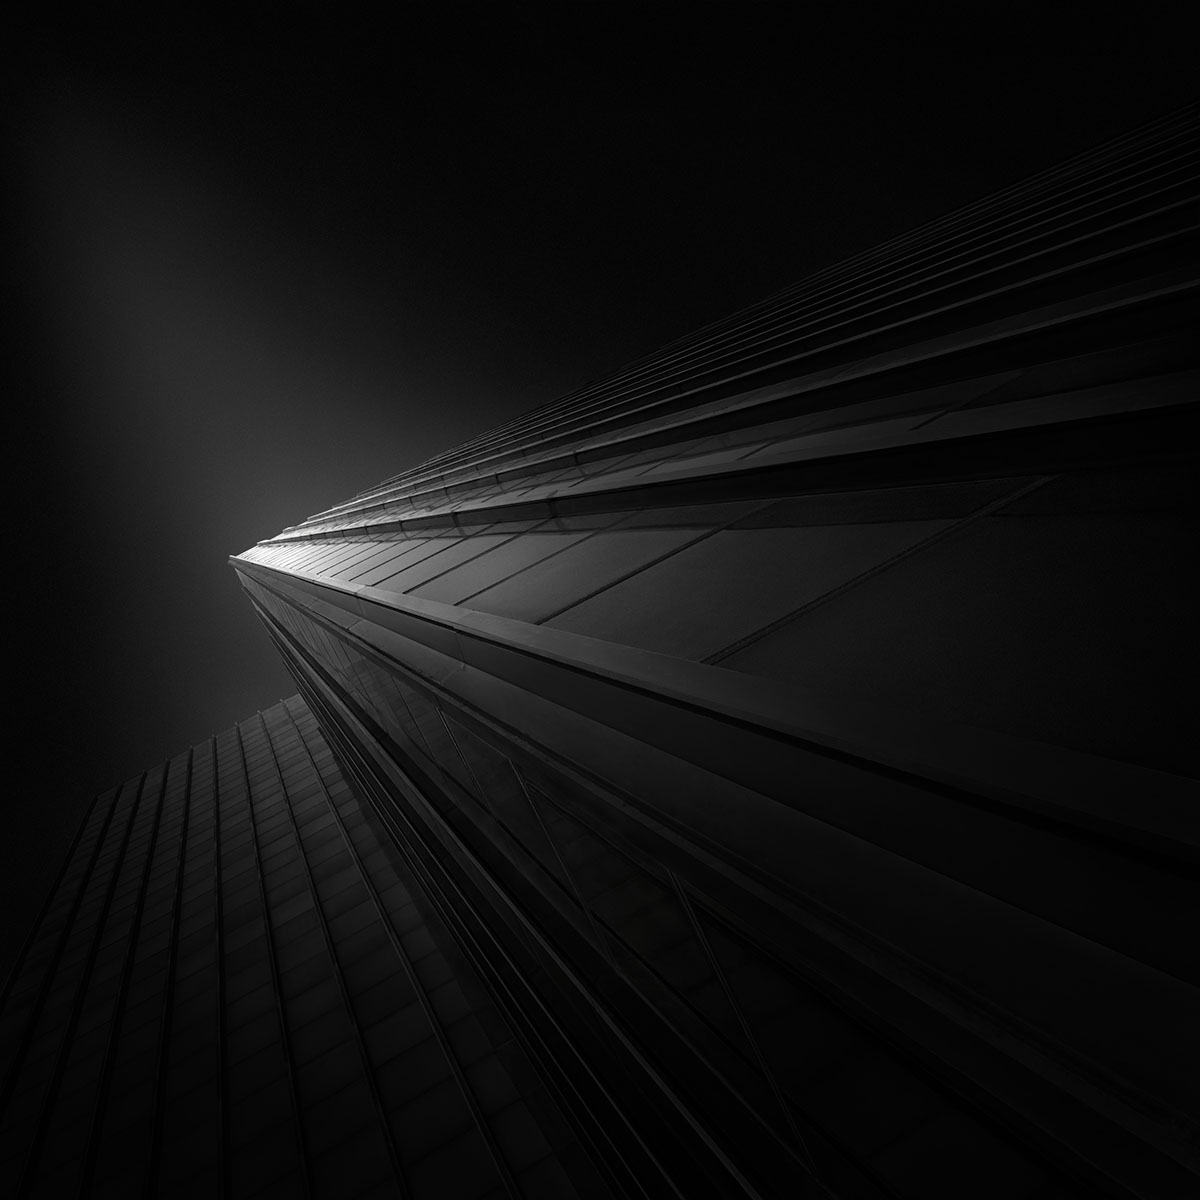 Ode to Black | Black Hope III - Animus Black © Julia Anna Gospodarou 2013